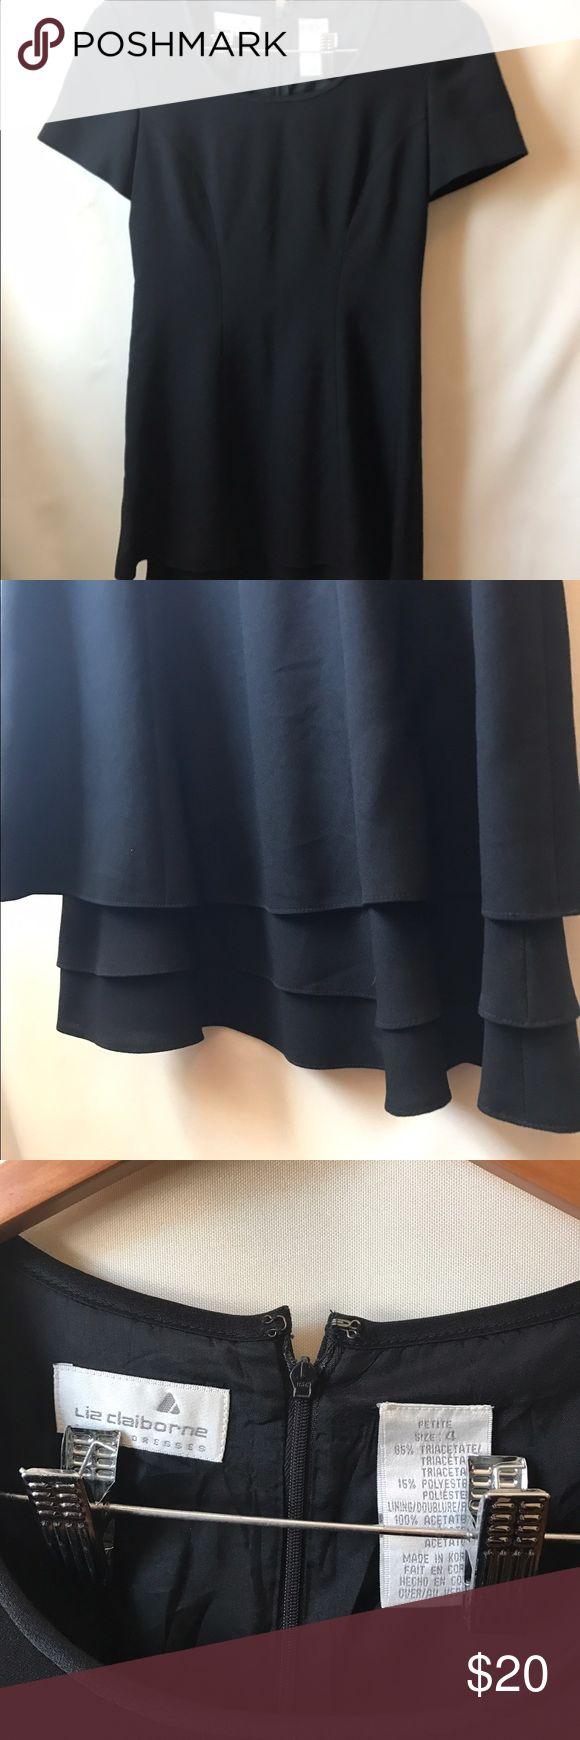 Liz Claiborne black dress Liz Claiborne black dress Liz Claiborne Dresses